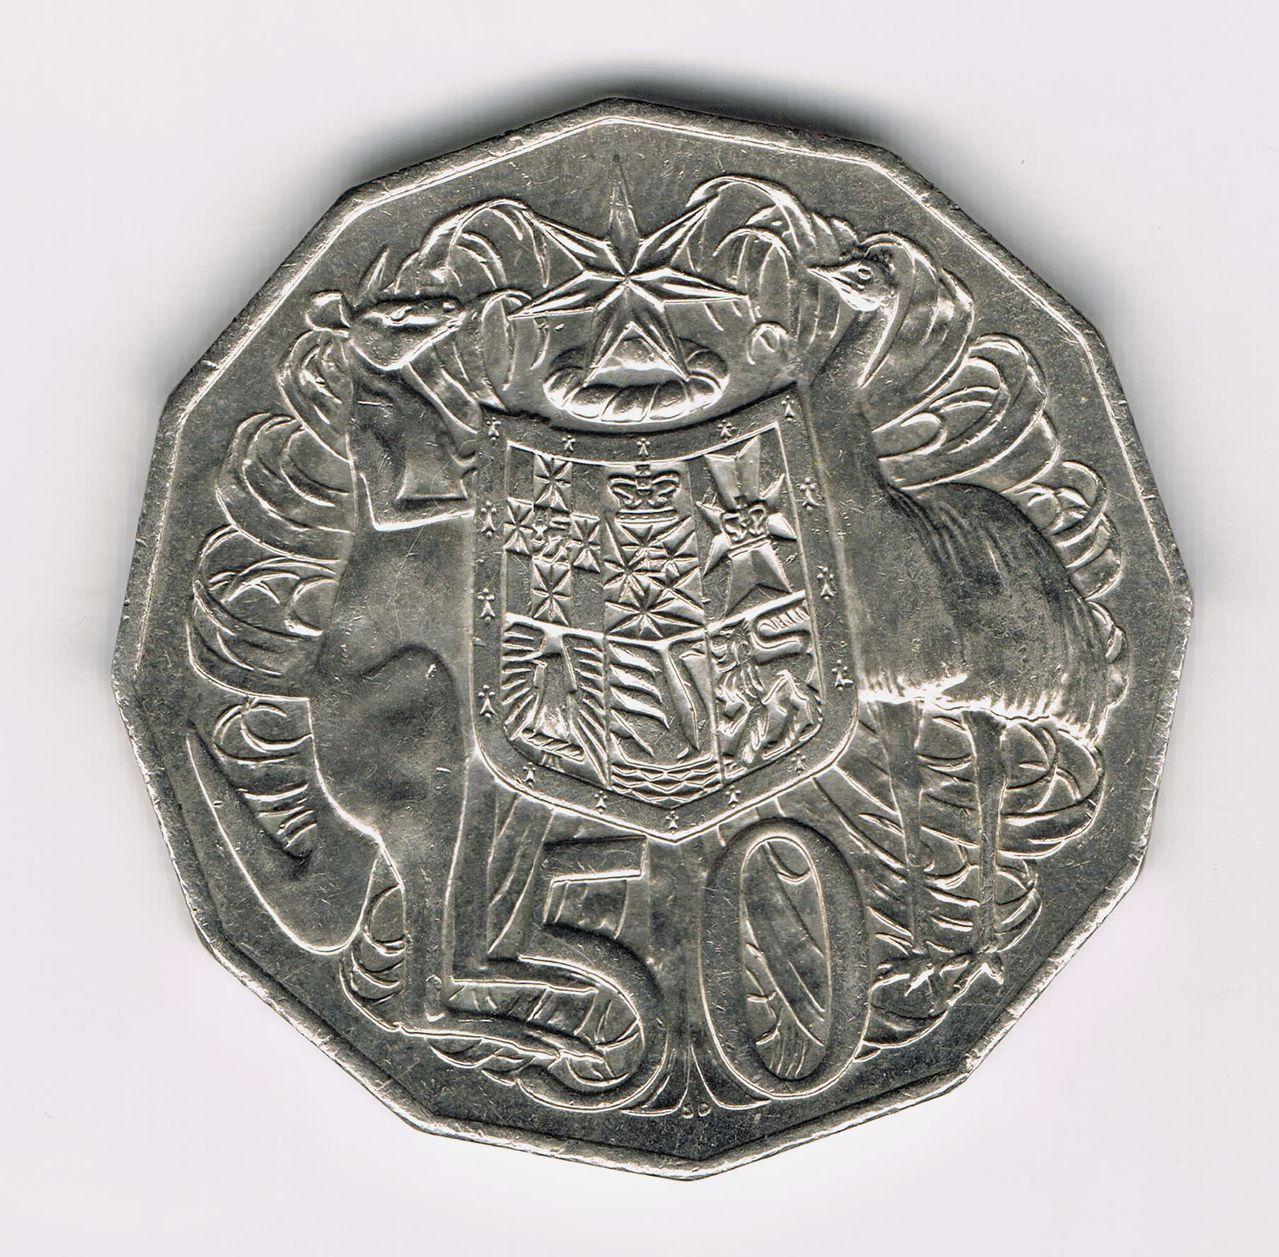 50 centavos Australia 2012 50_Cent_Australia_b